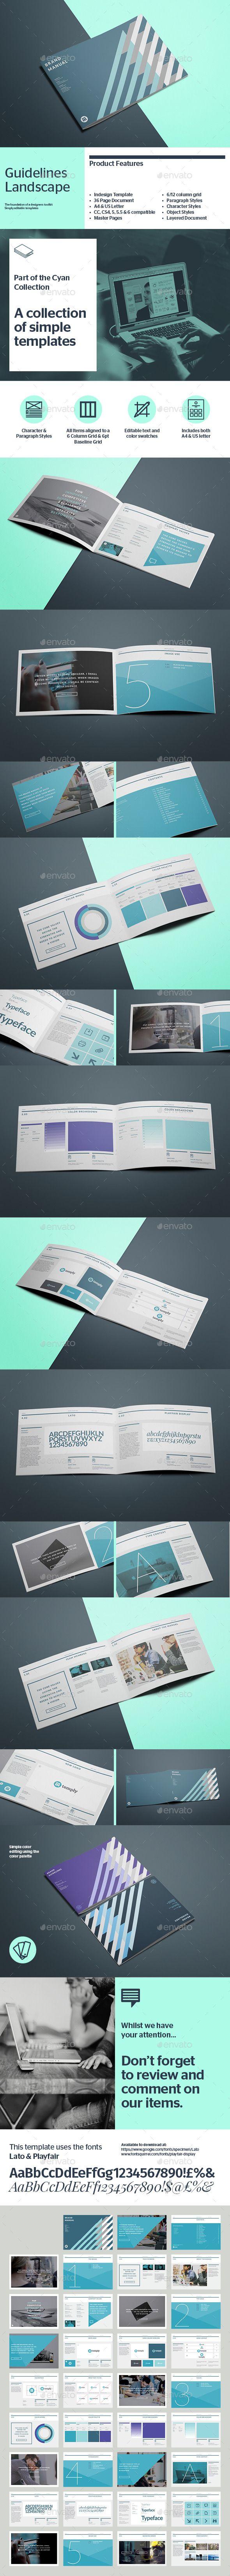 Brand Manual Horizontal | GraphicRiver